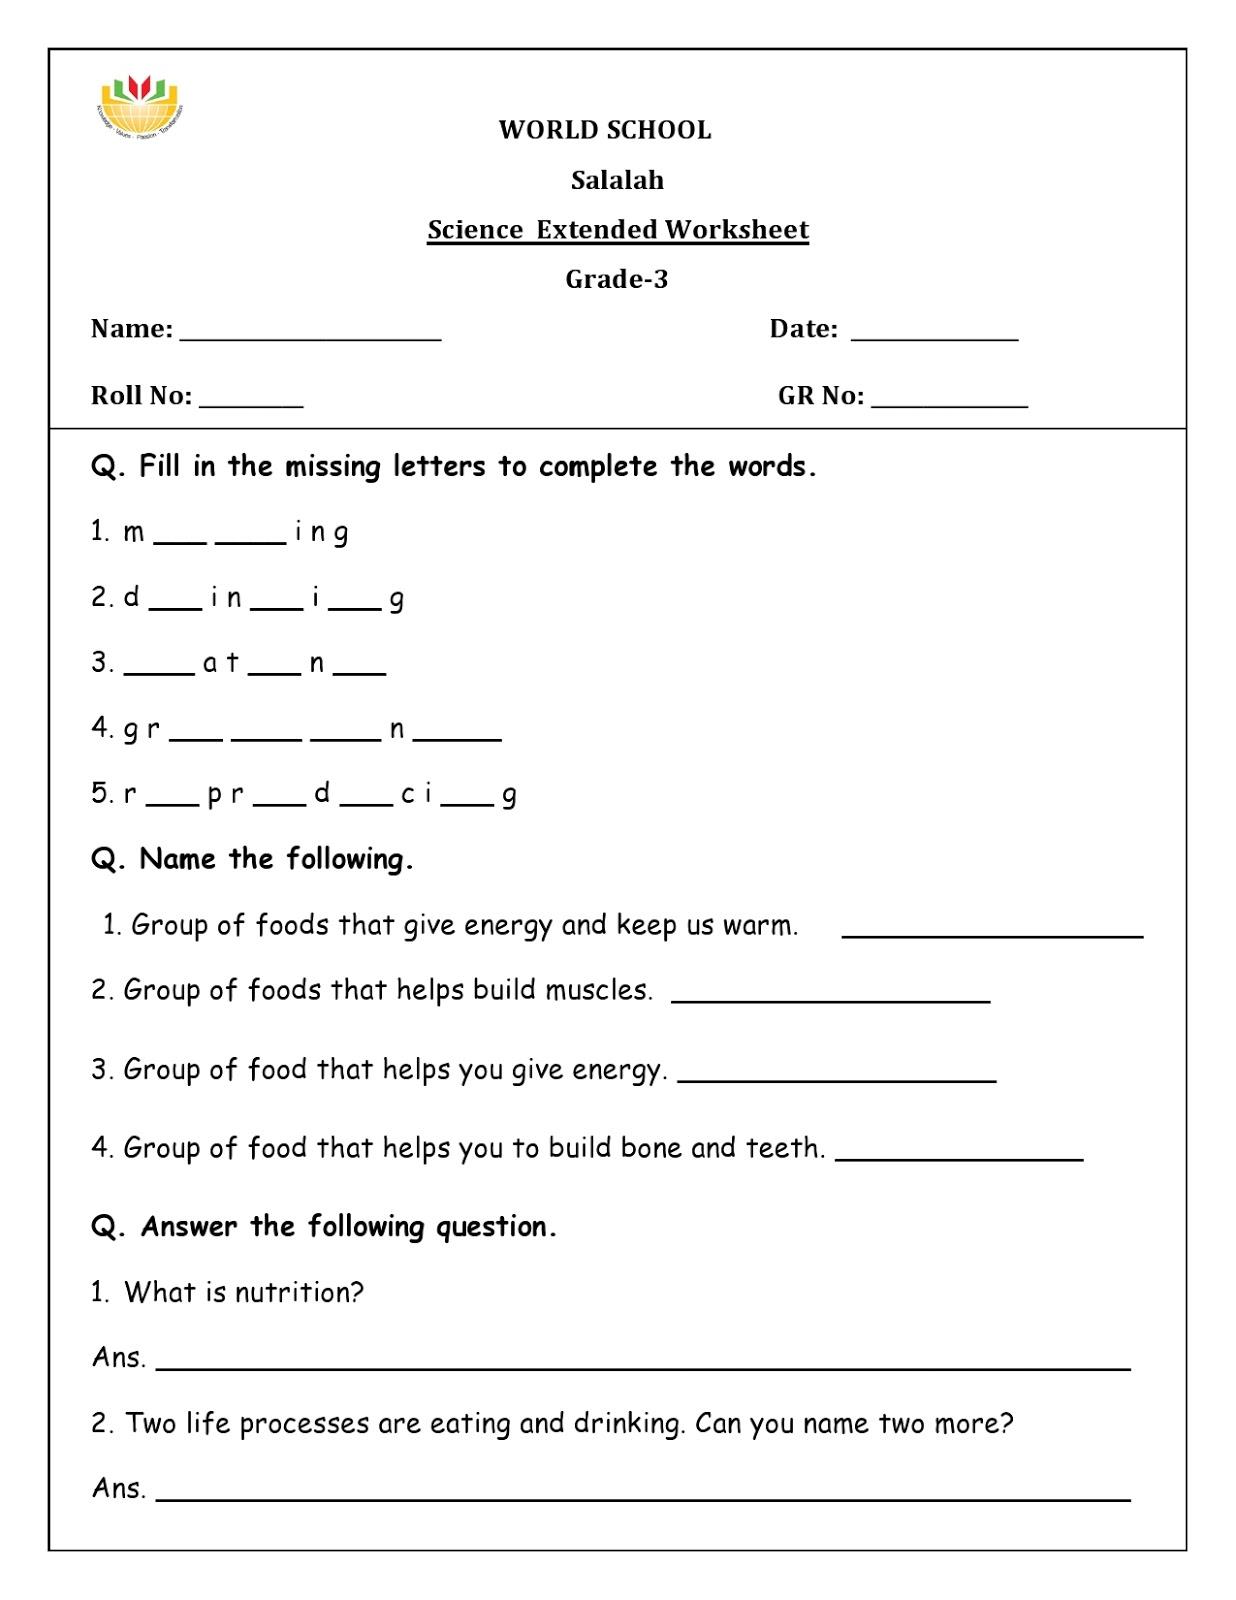 Homework for Grade 3 as on 26/04/2018 | WORLD SCHOOL OMAN